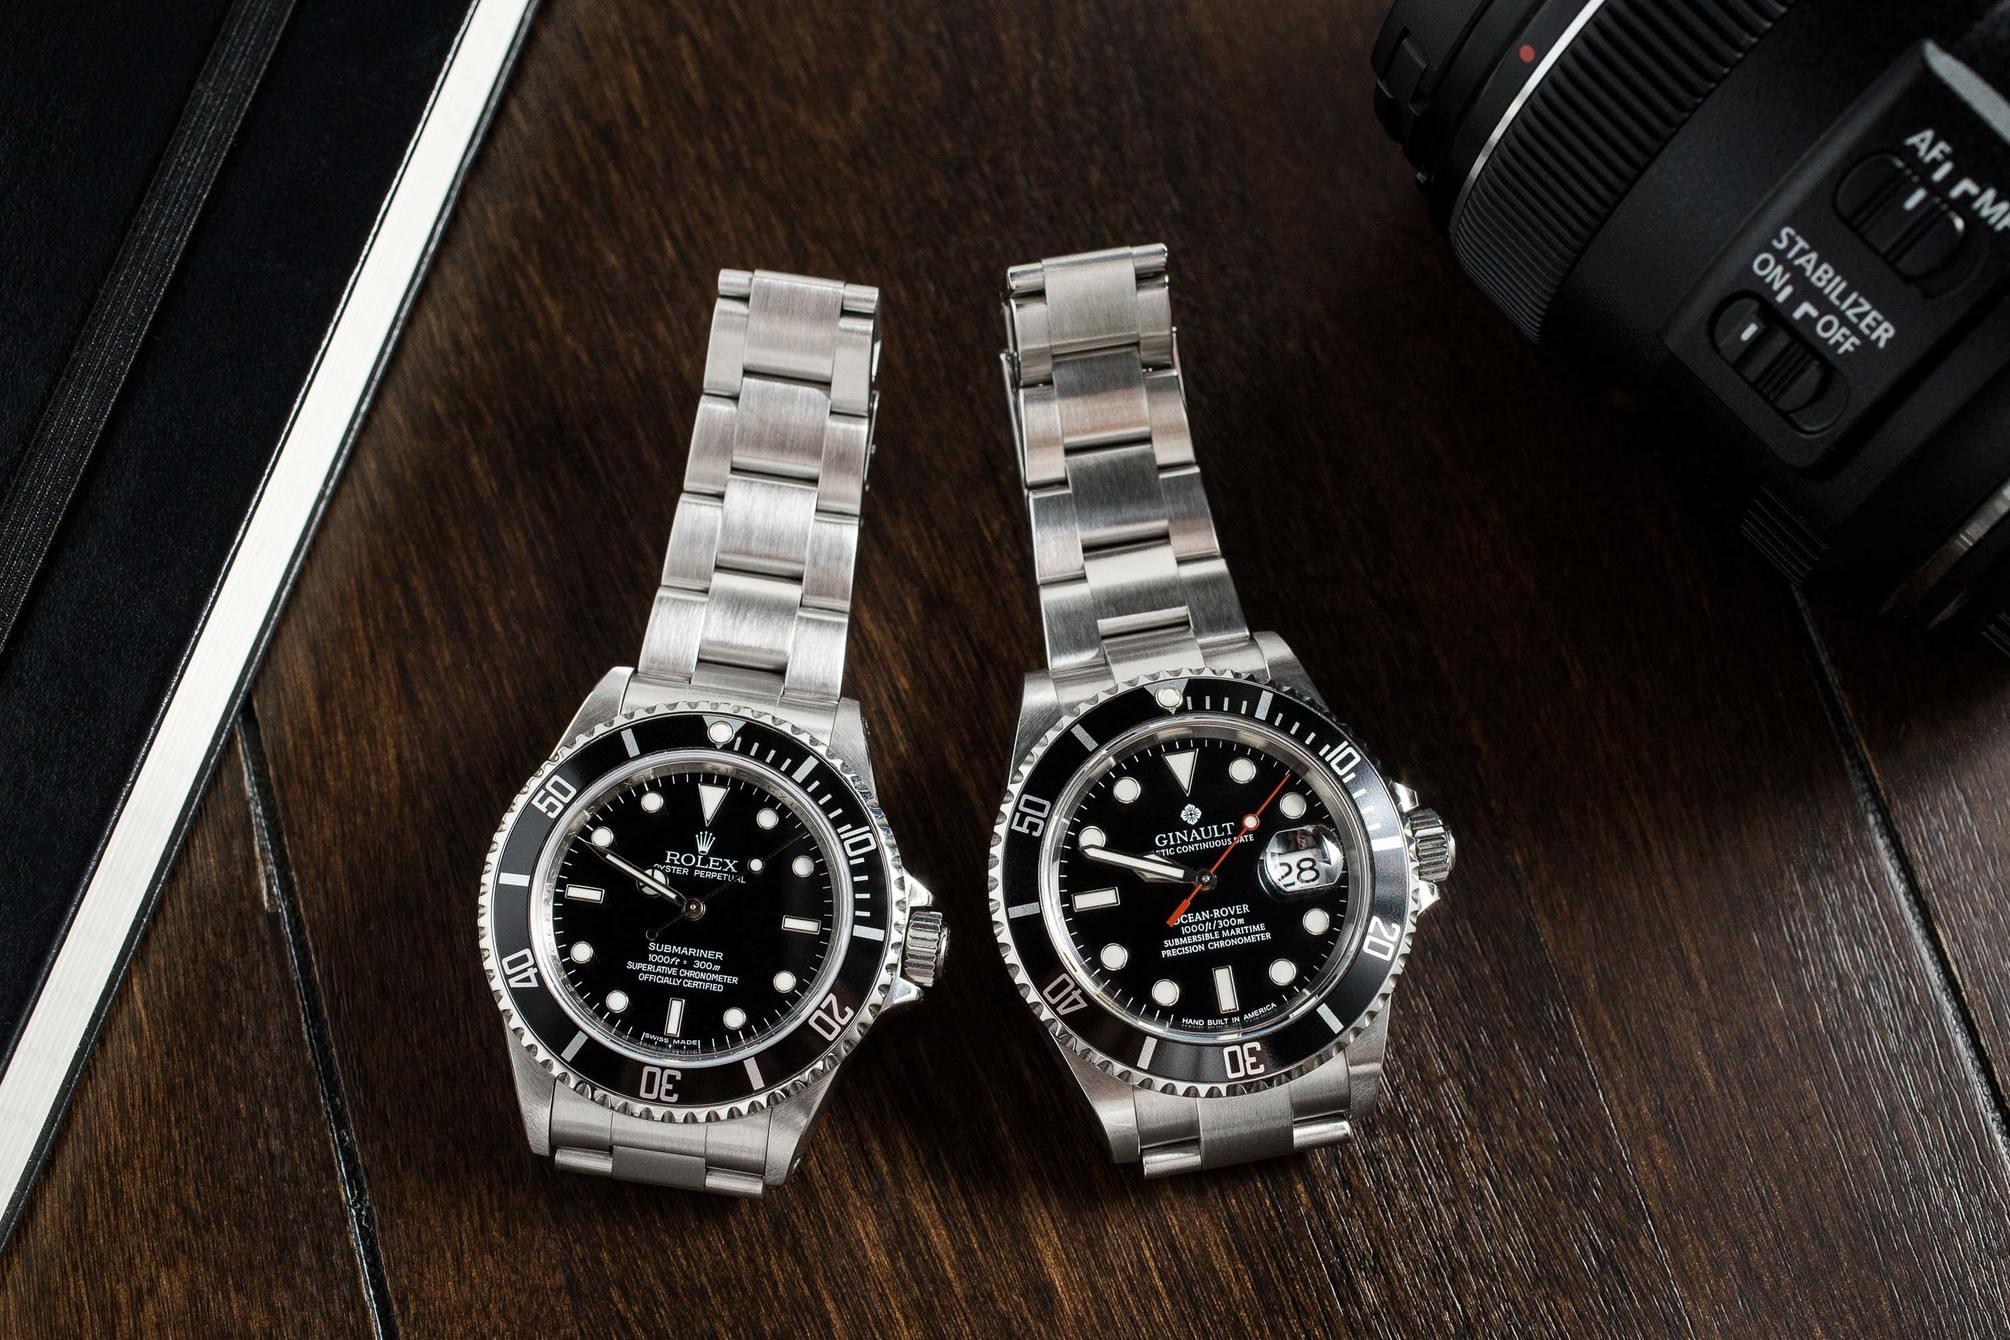 Ginault vs Rolex